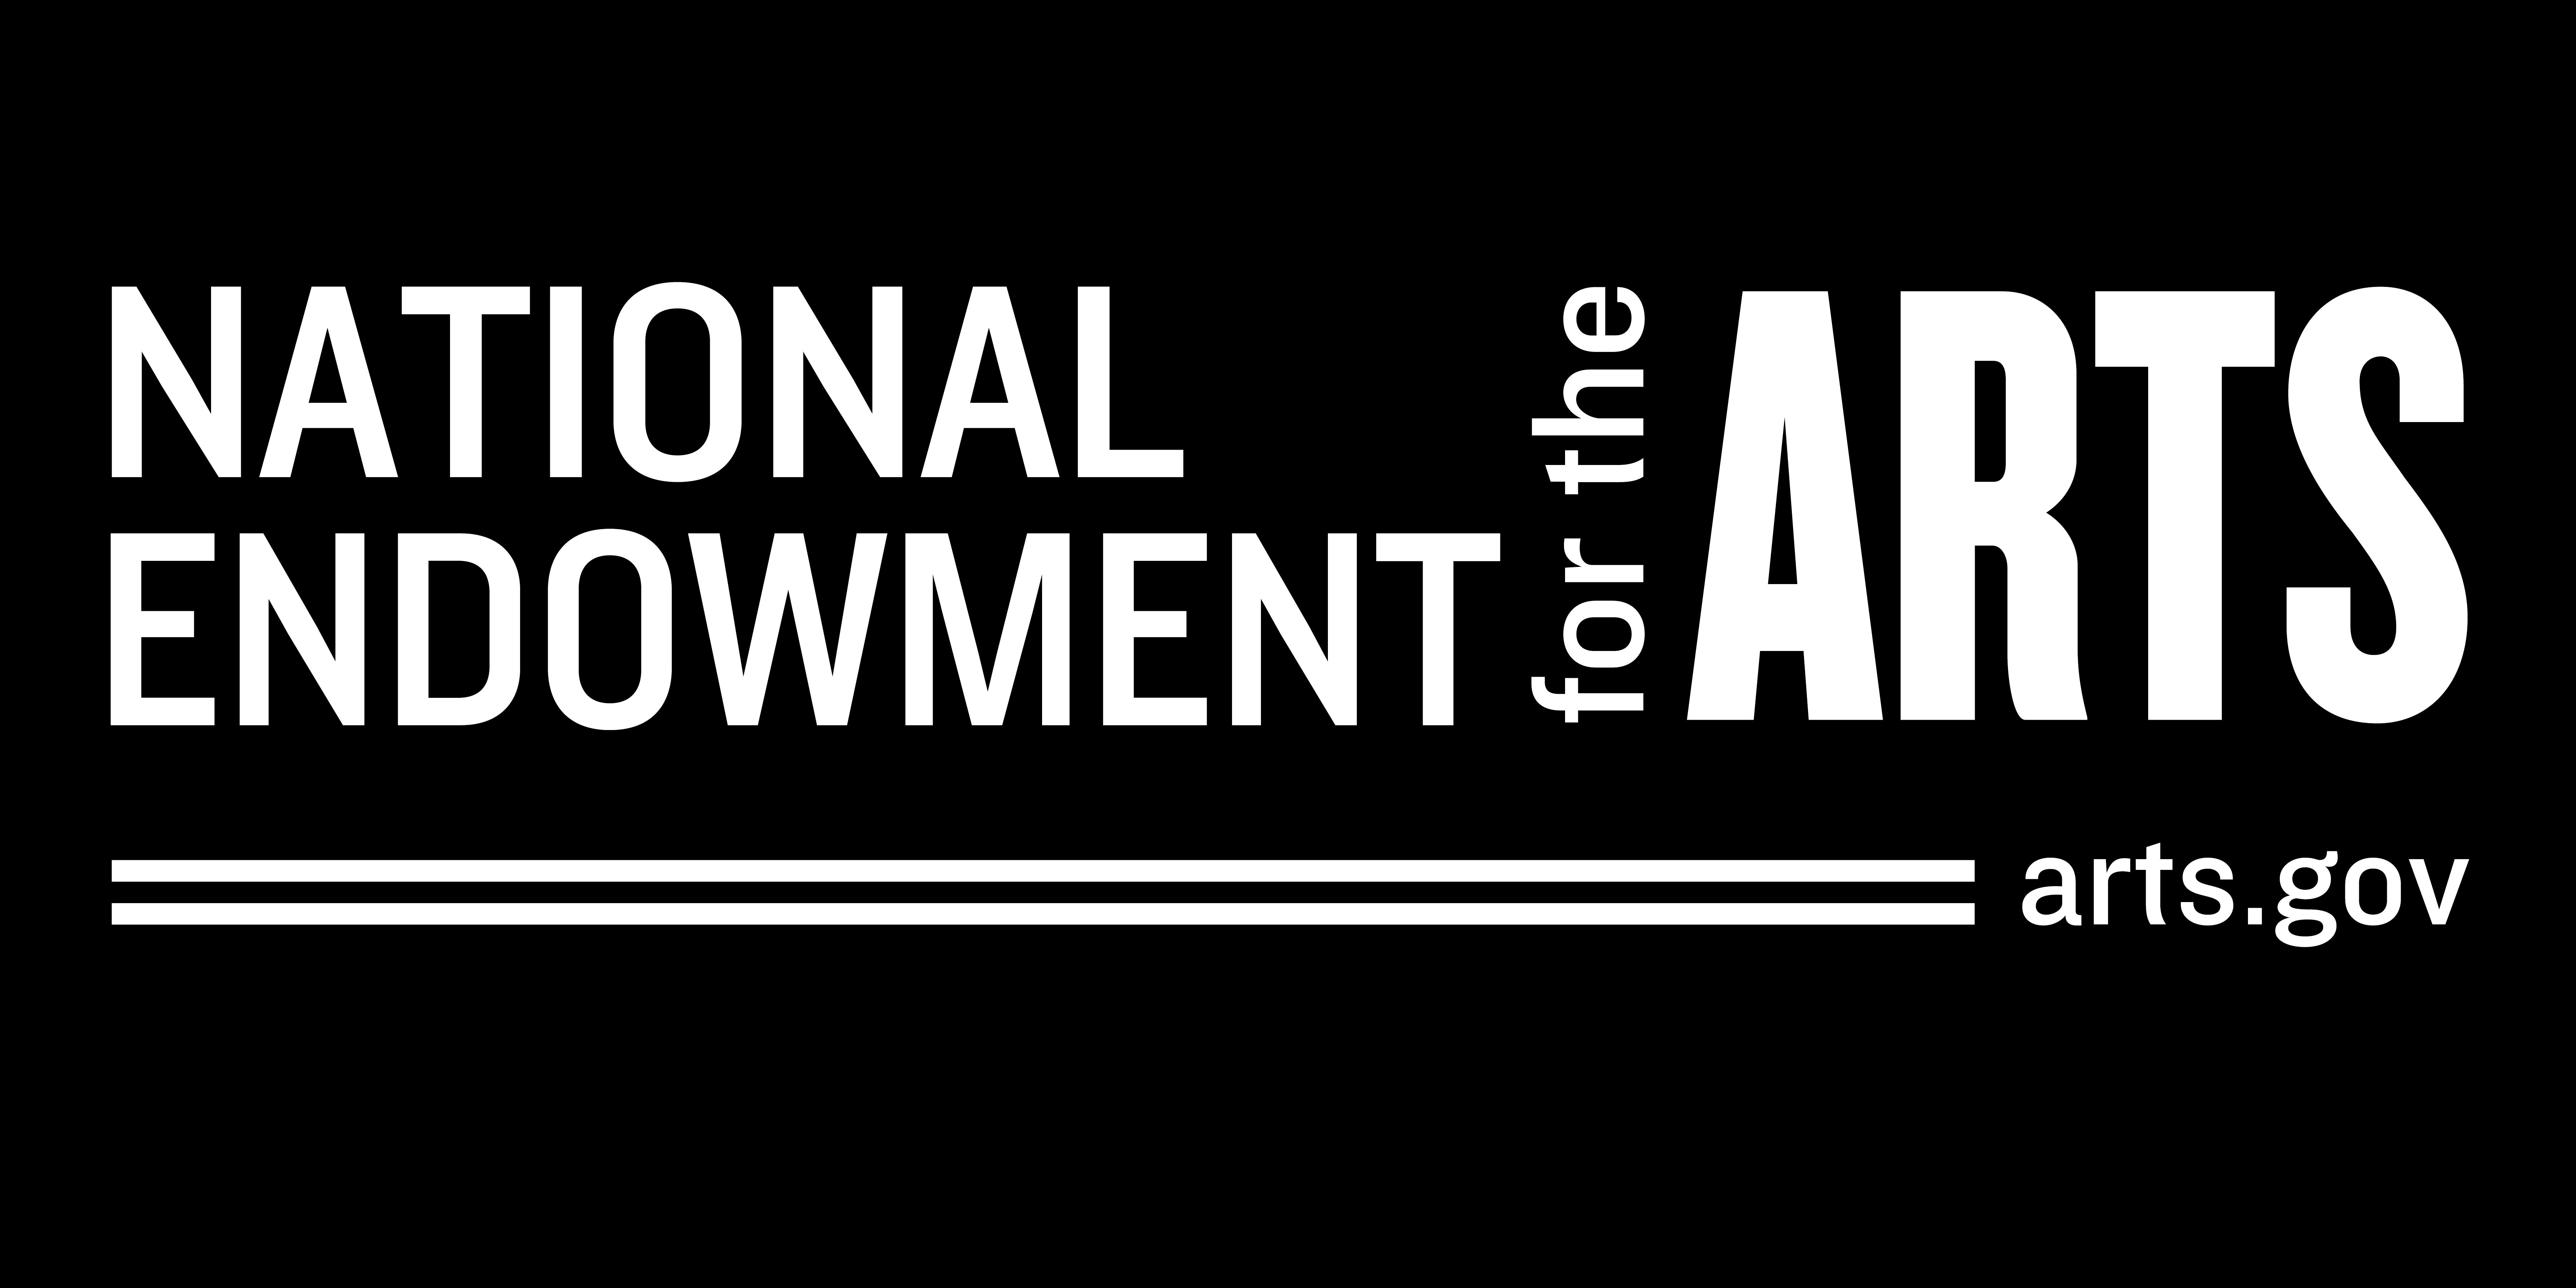 Nea Logo National Endowment For The Arts